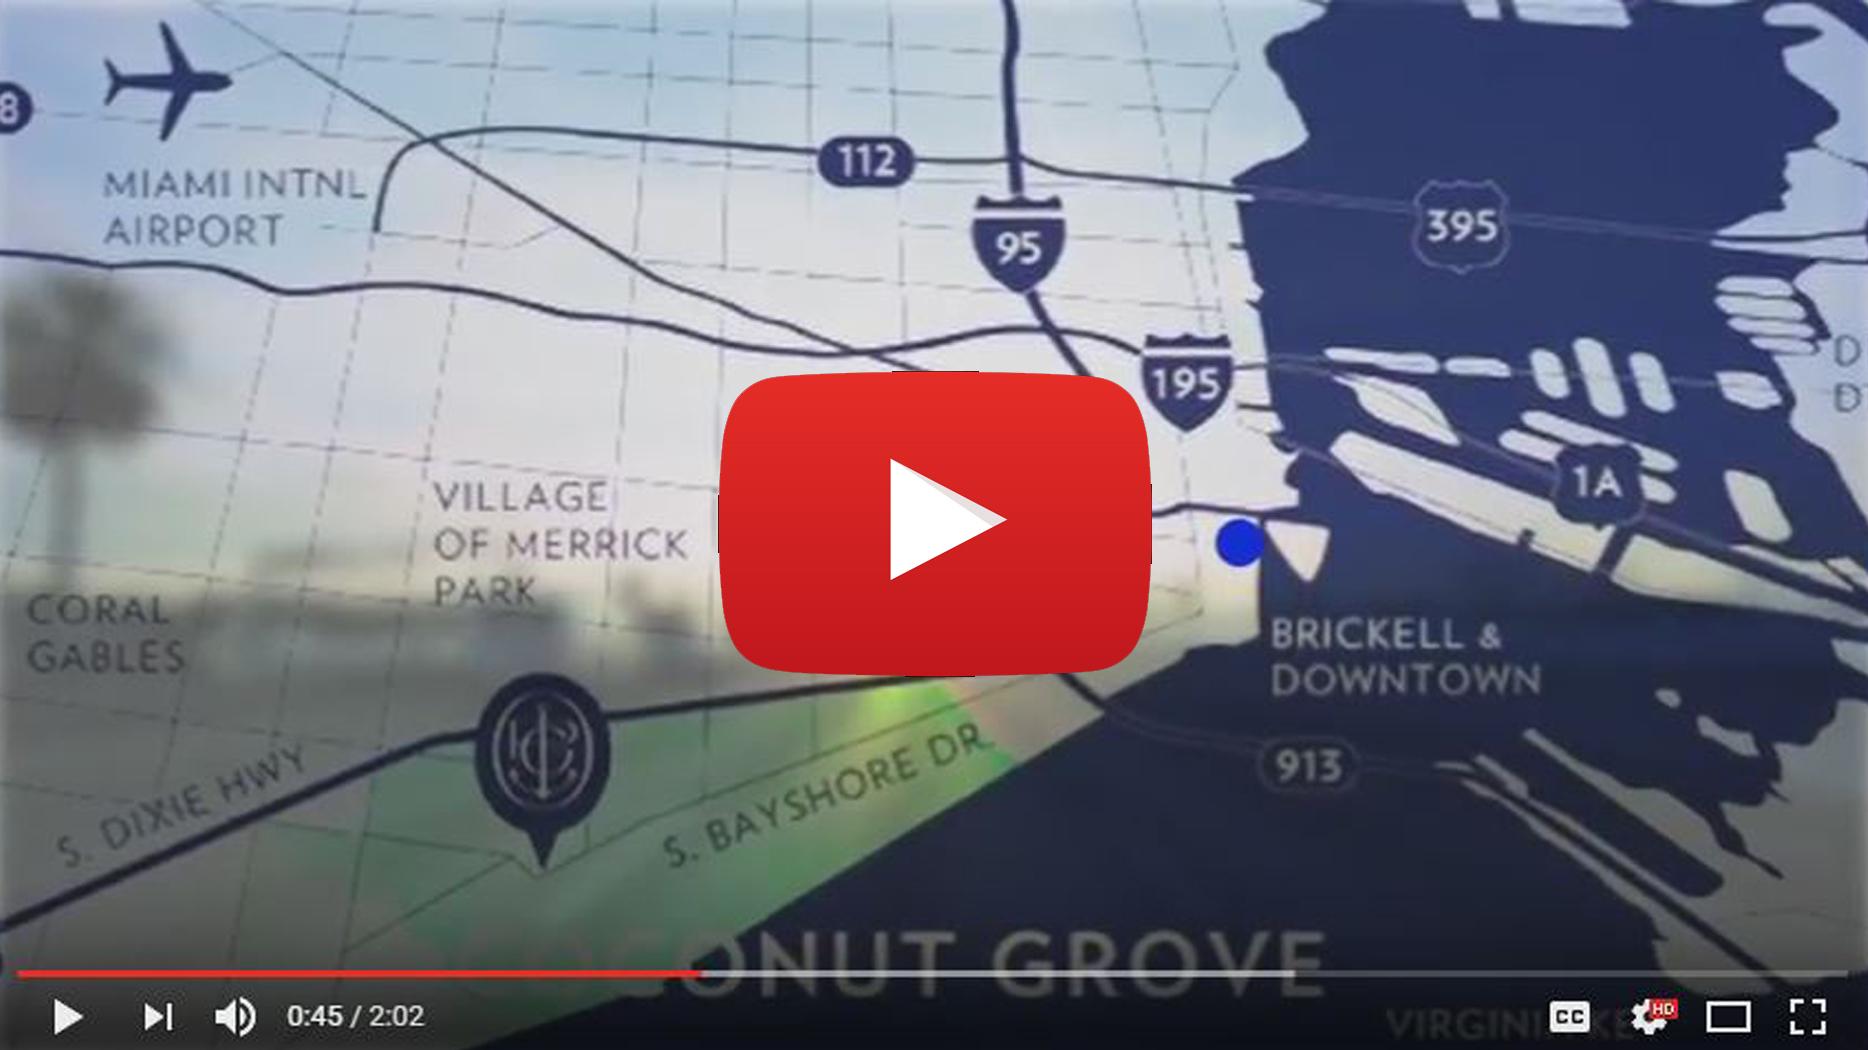 Watch JAMS Miami Resolution Center Video